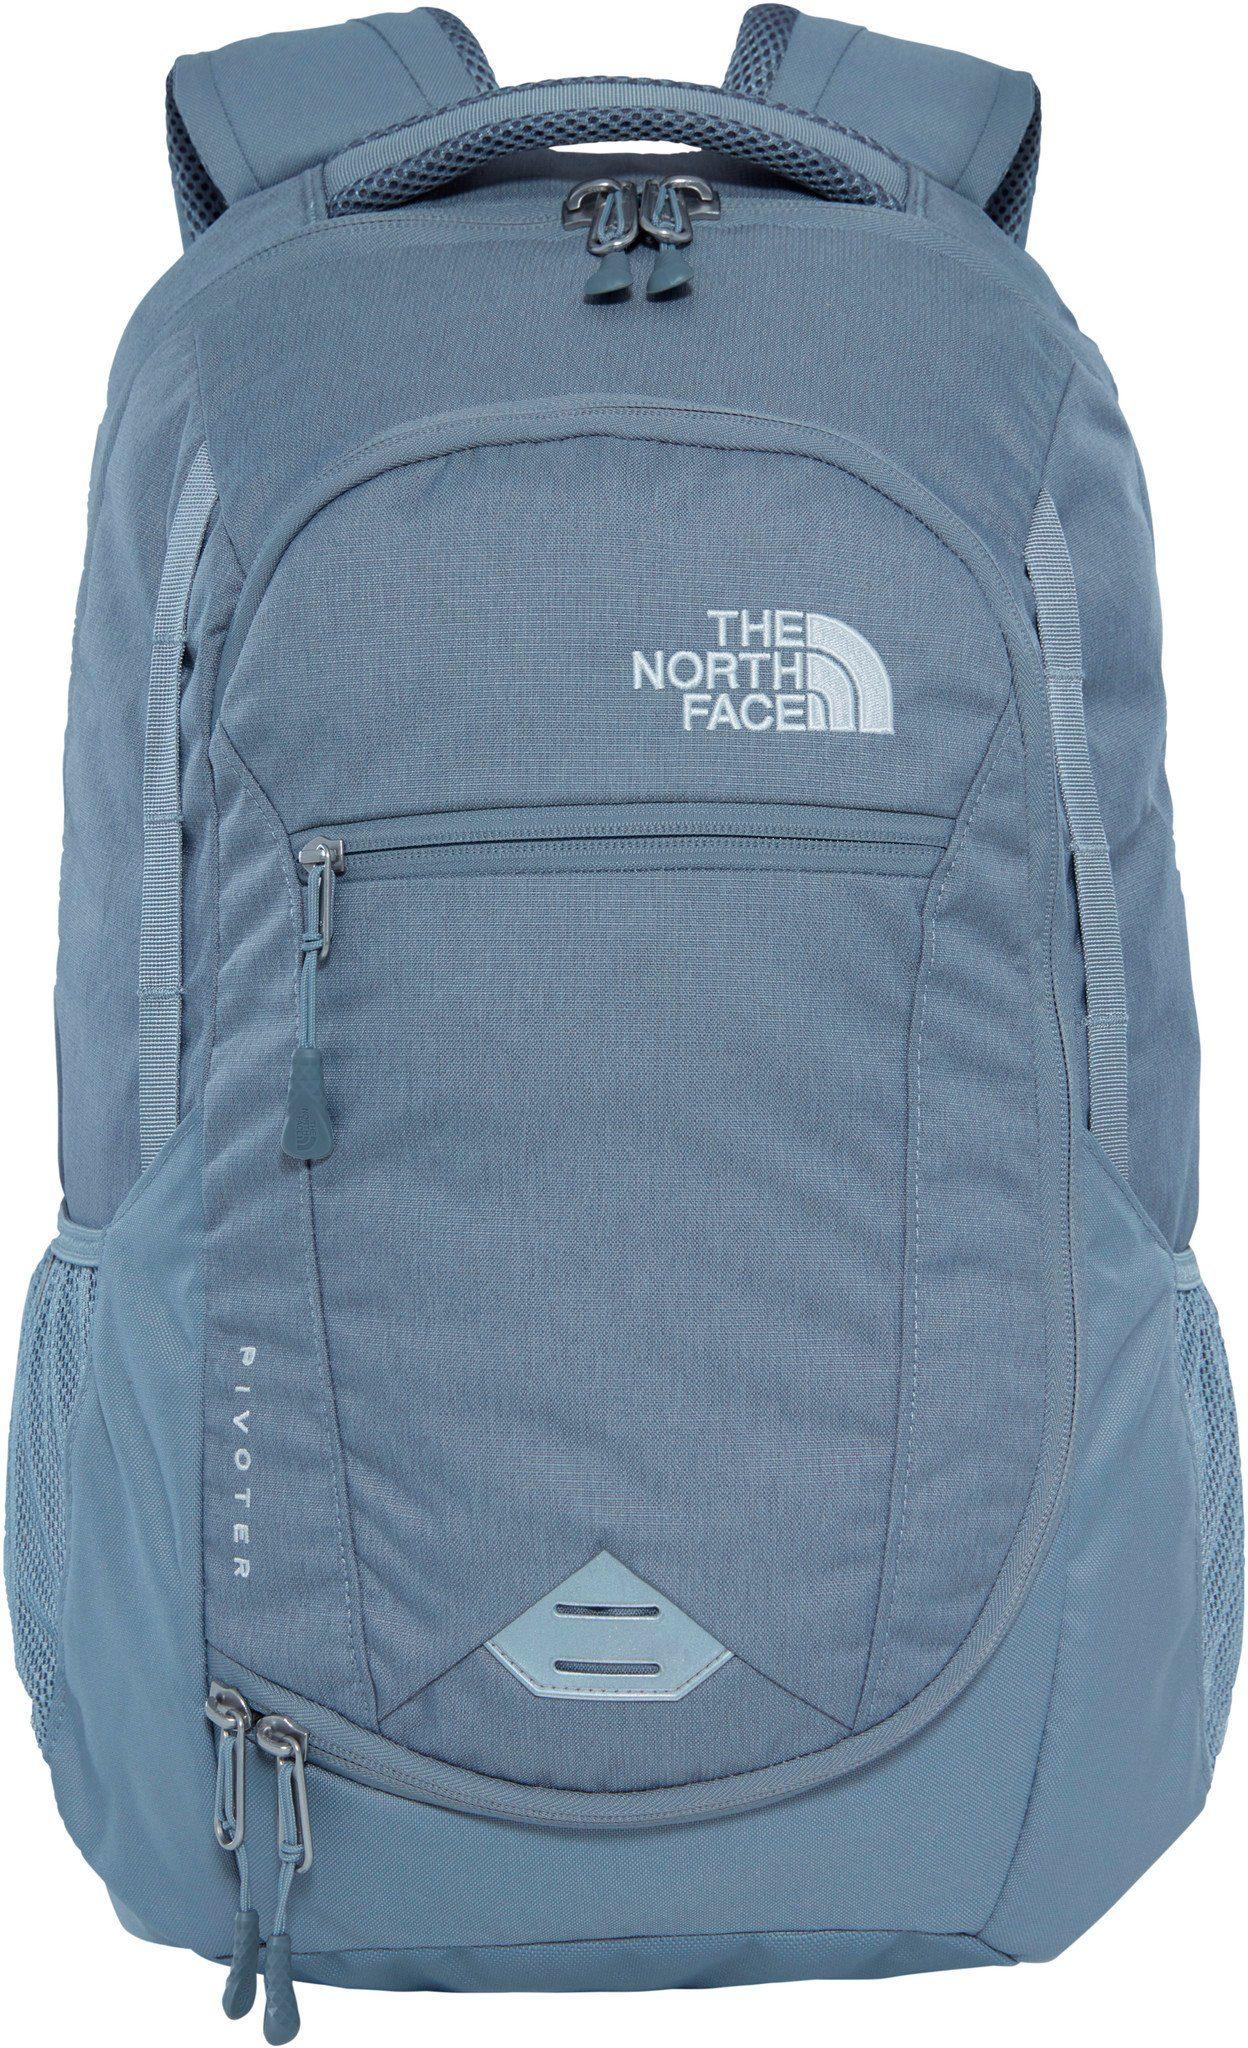 The North Face Wanderrucksack »Pivoter Backpack«